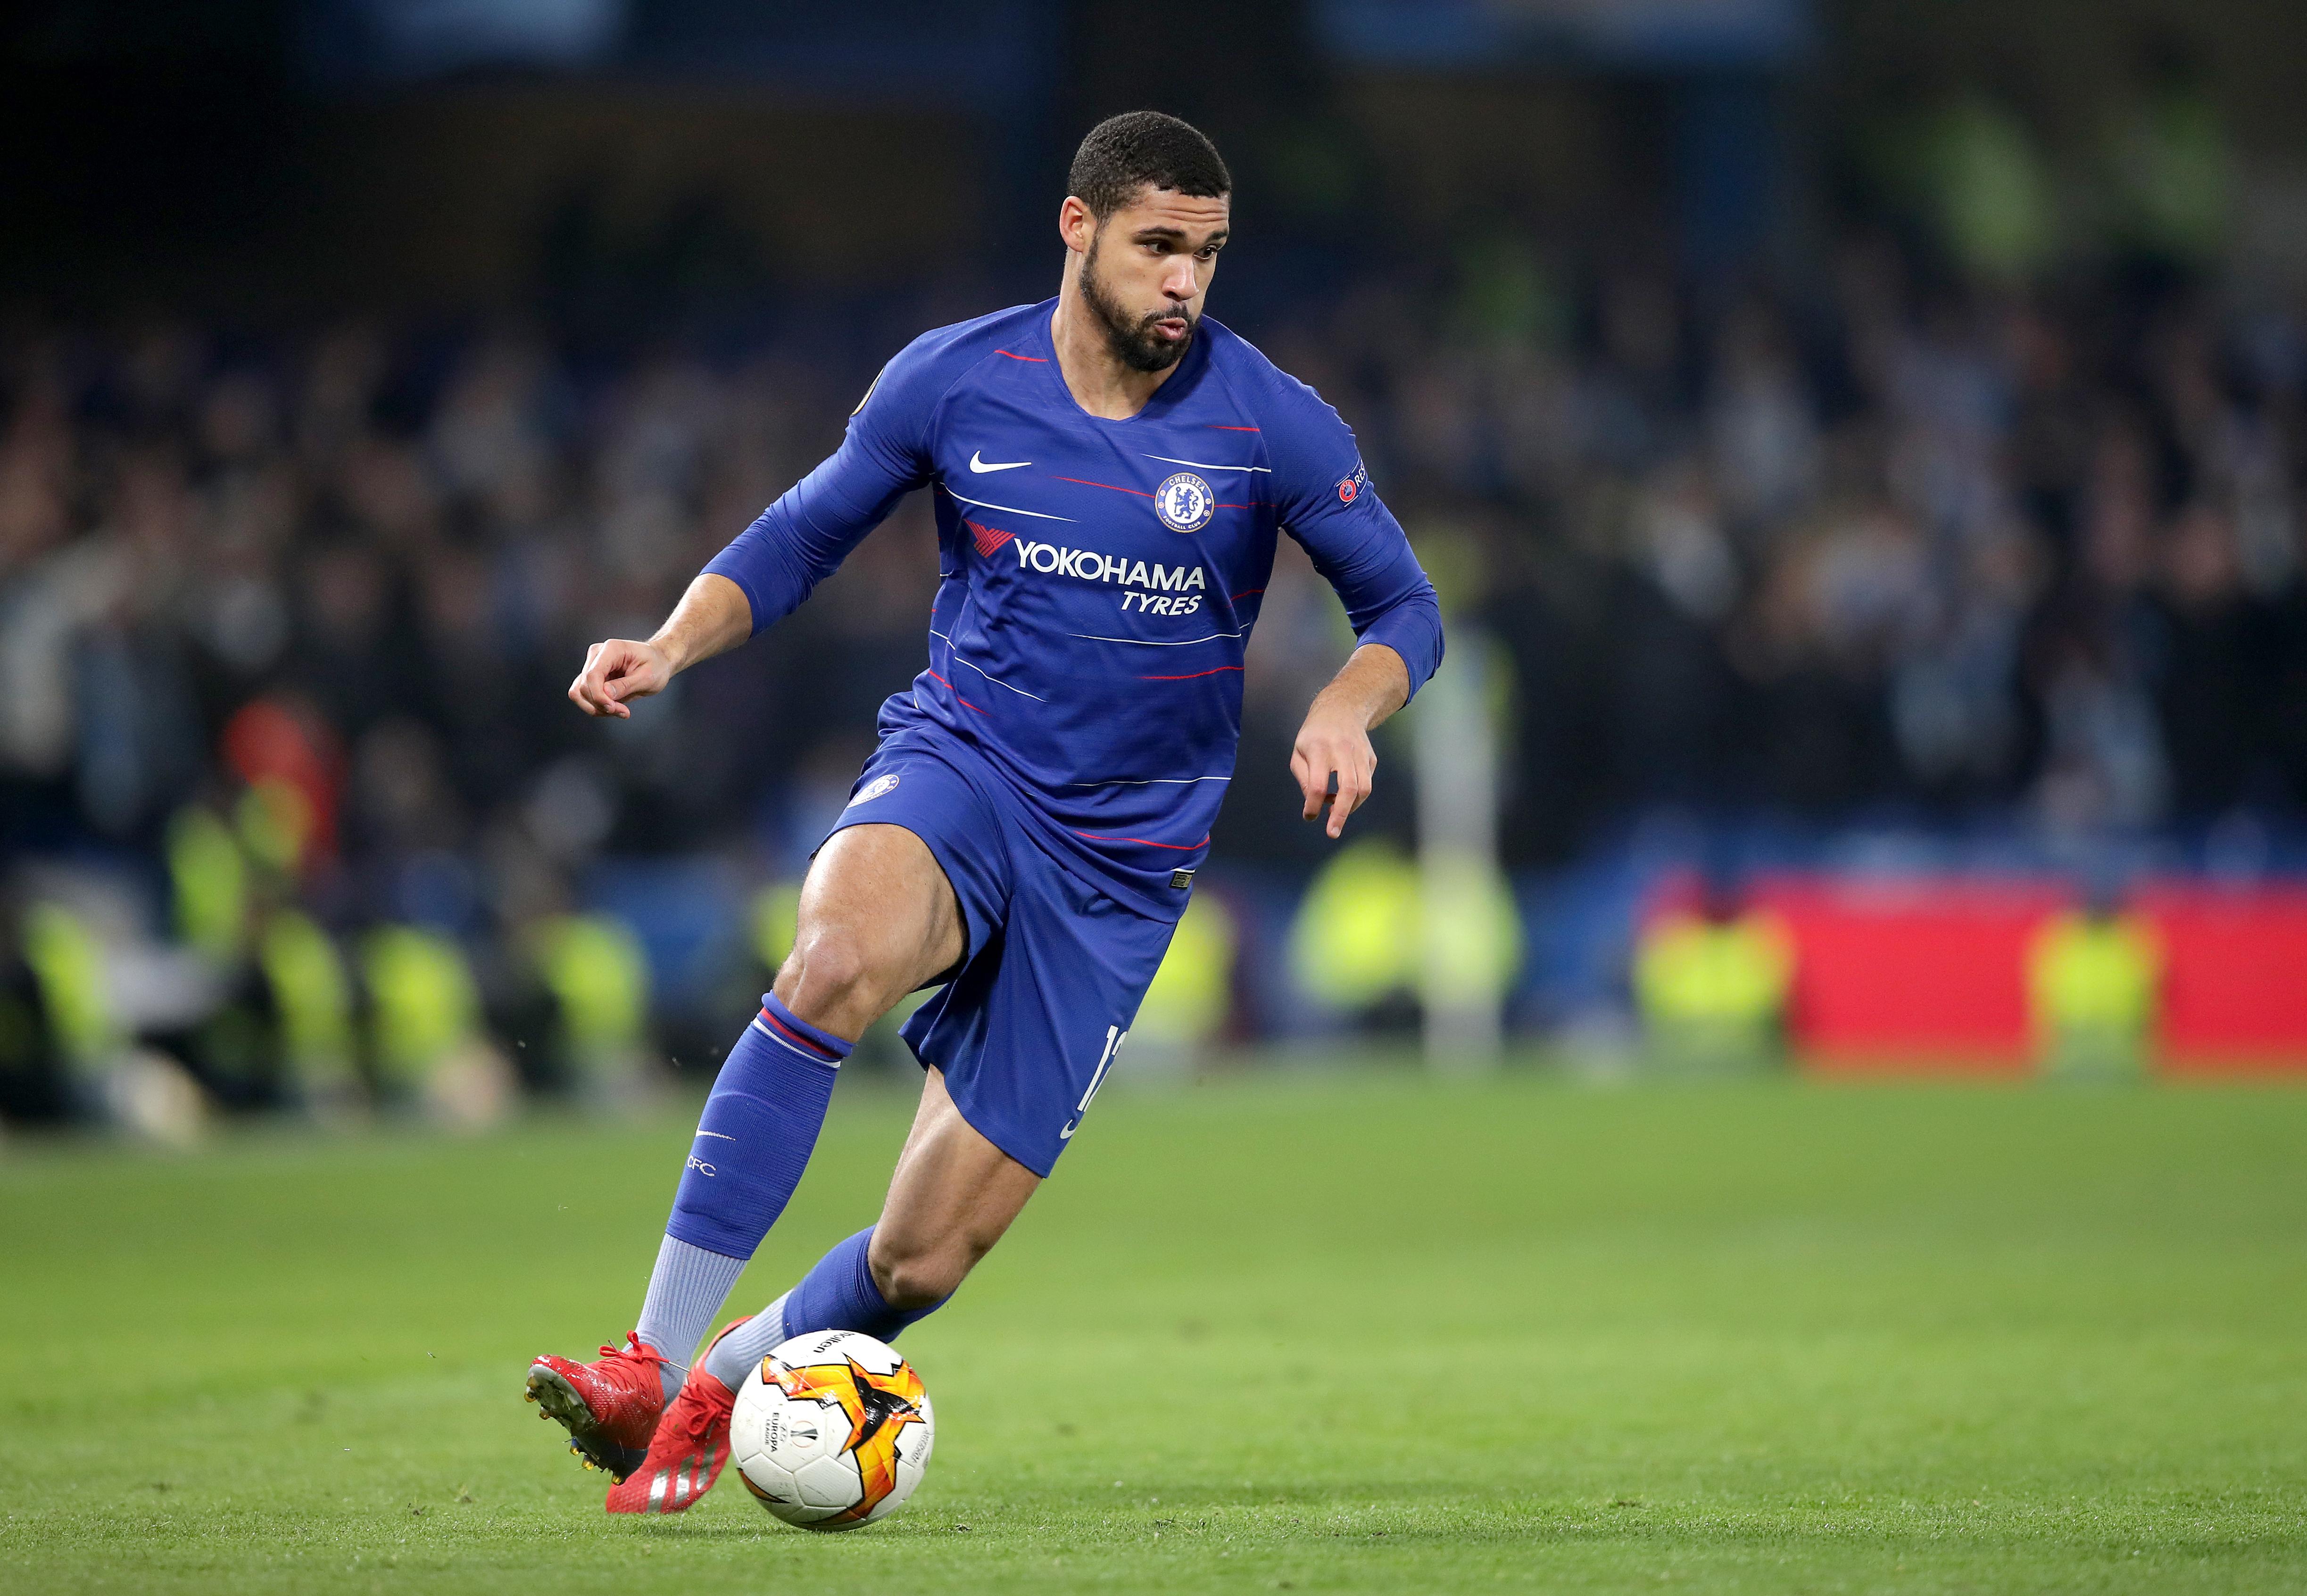 Ruben Loftus Cheek has been in sparkling form for Chelsea